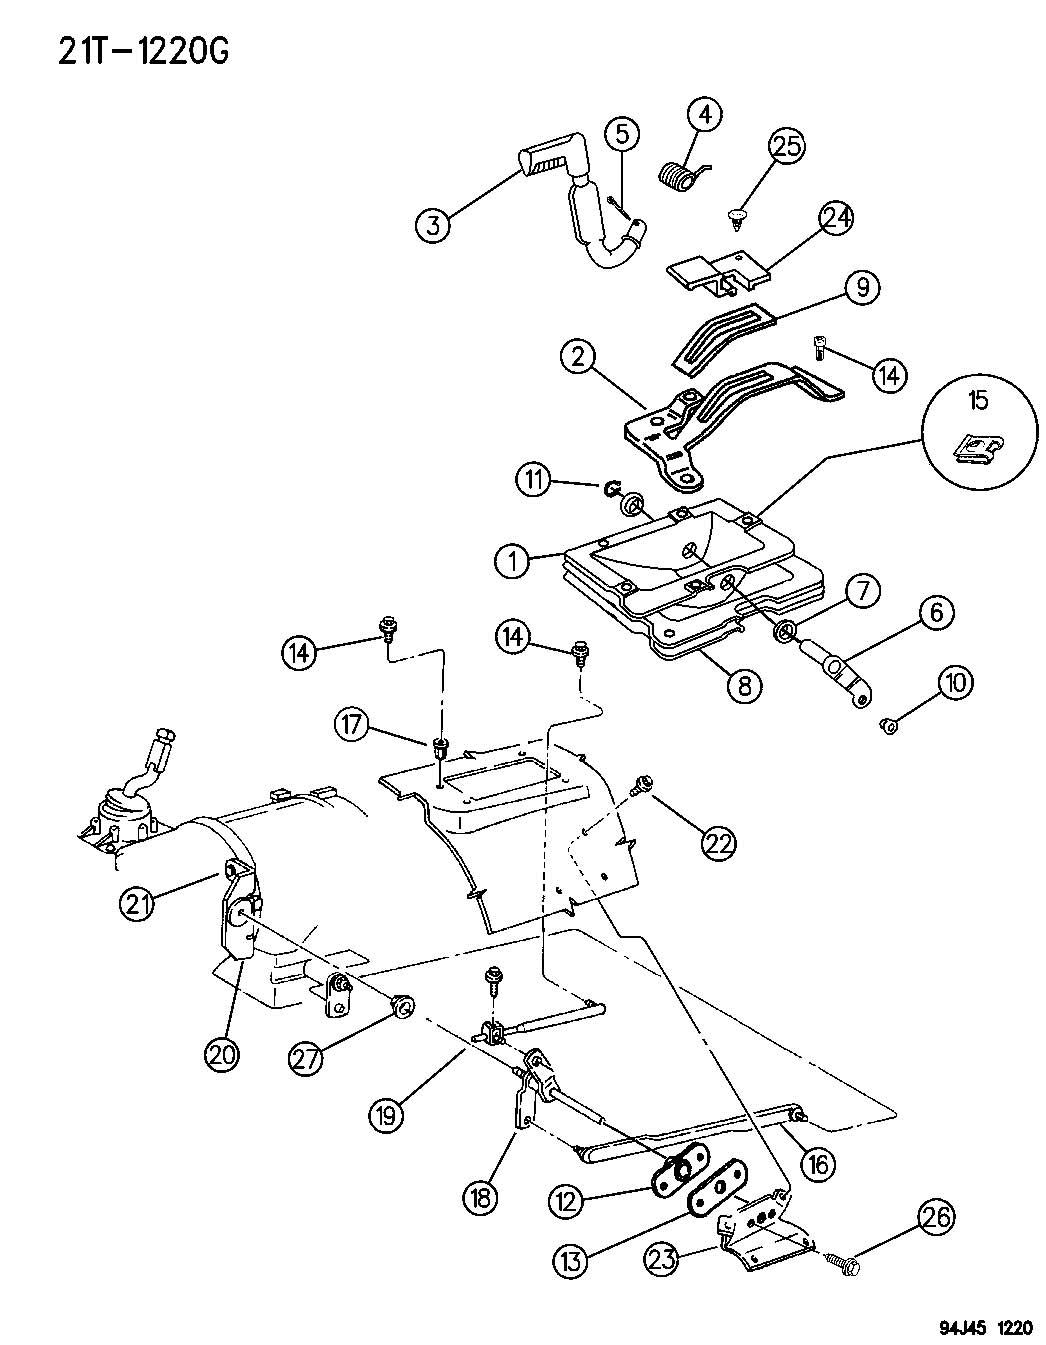 Jeep CONROLS SHIFT, SELECT TRACK, (DHP) GRAND CHEROKEE